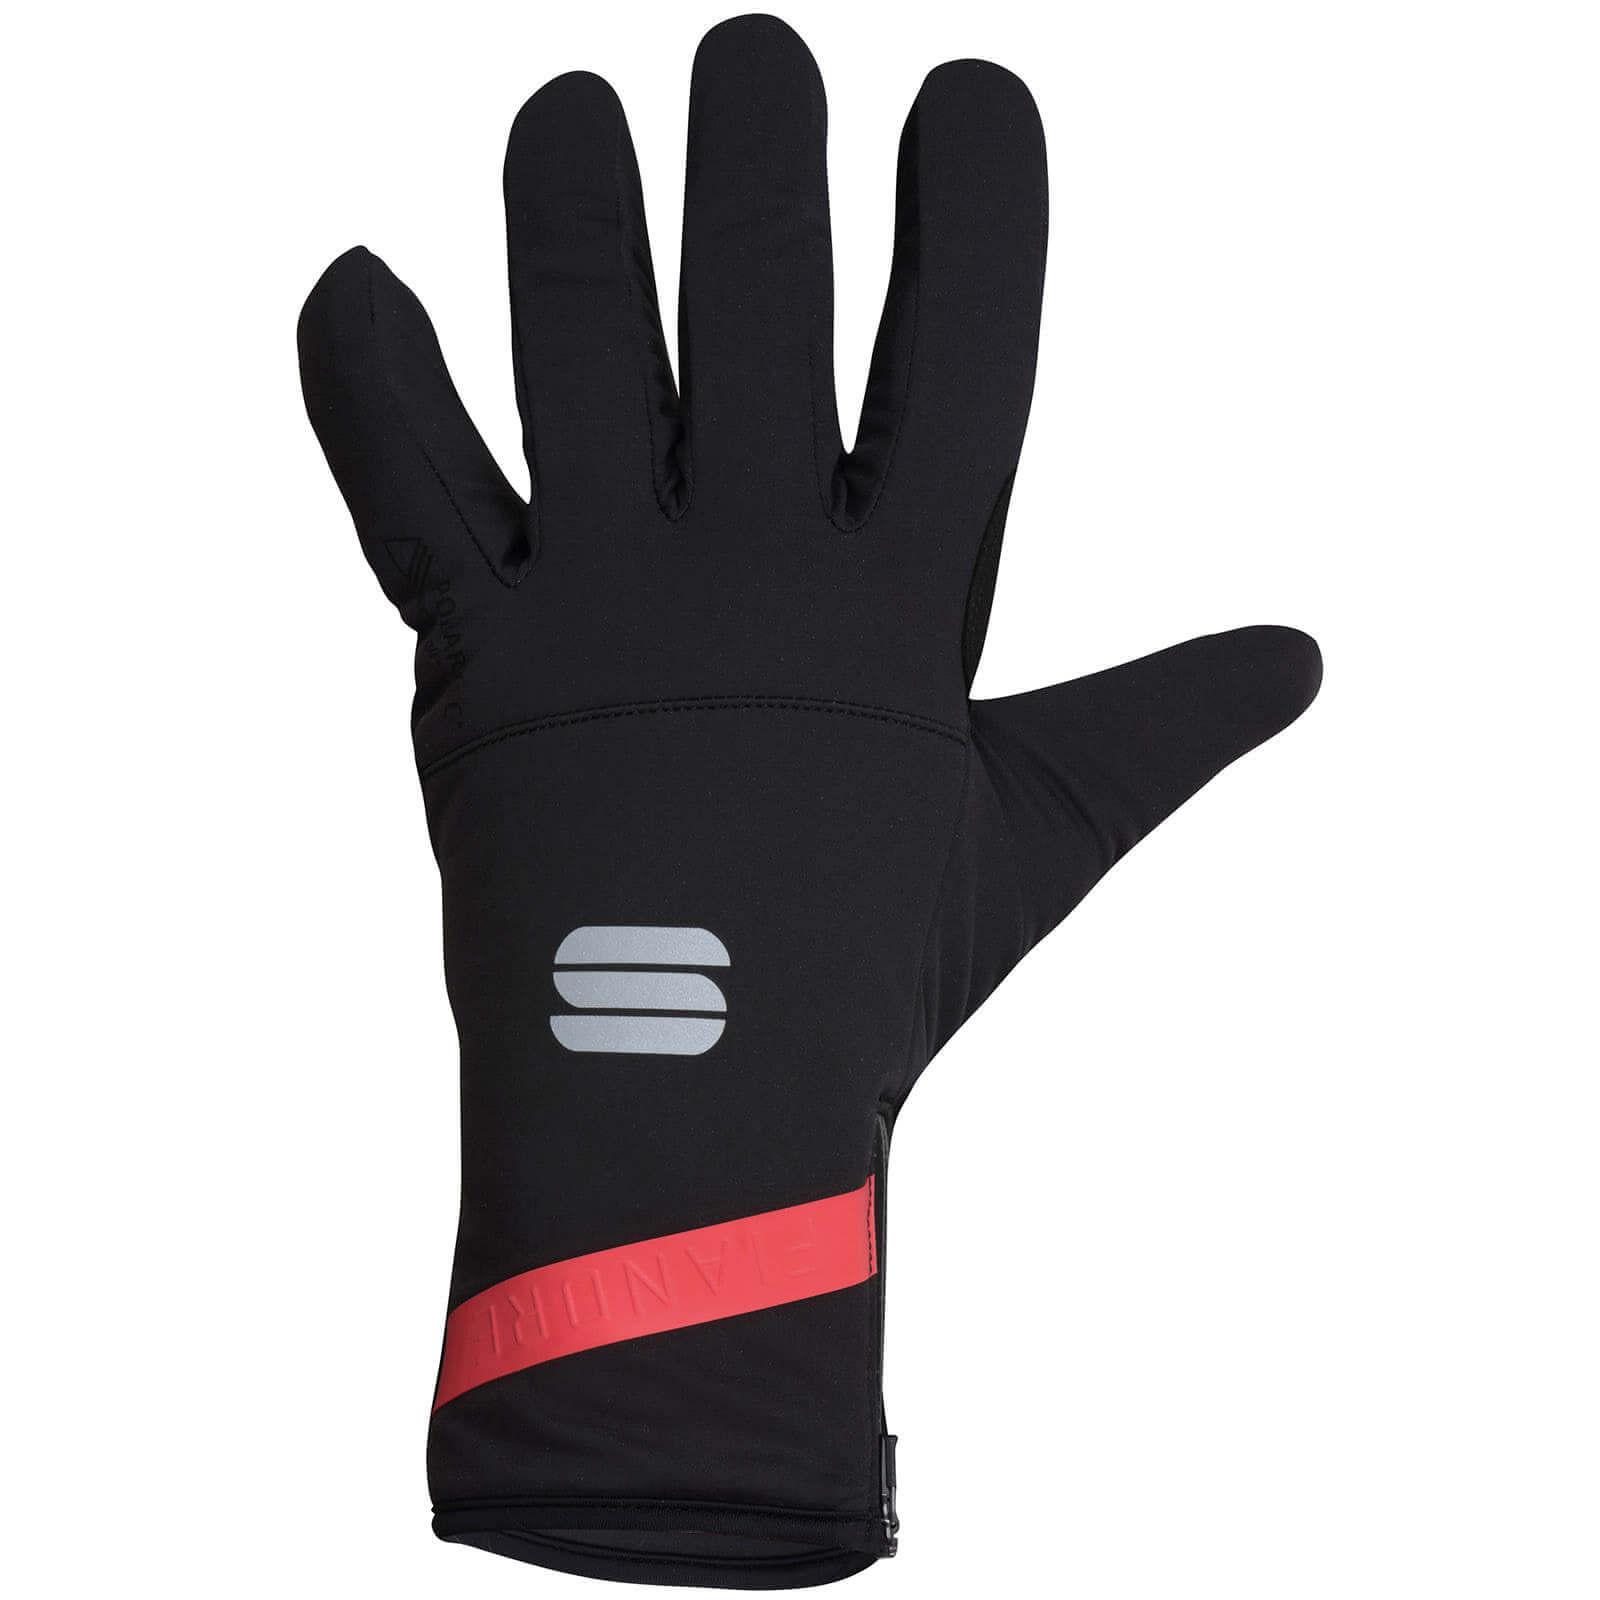 Sportful Fiandre Gloves - Black - M